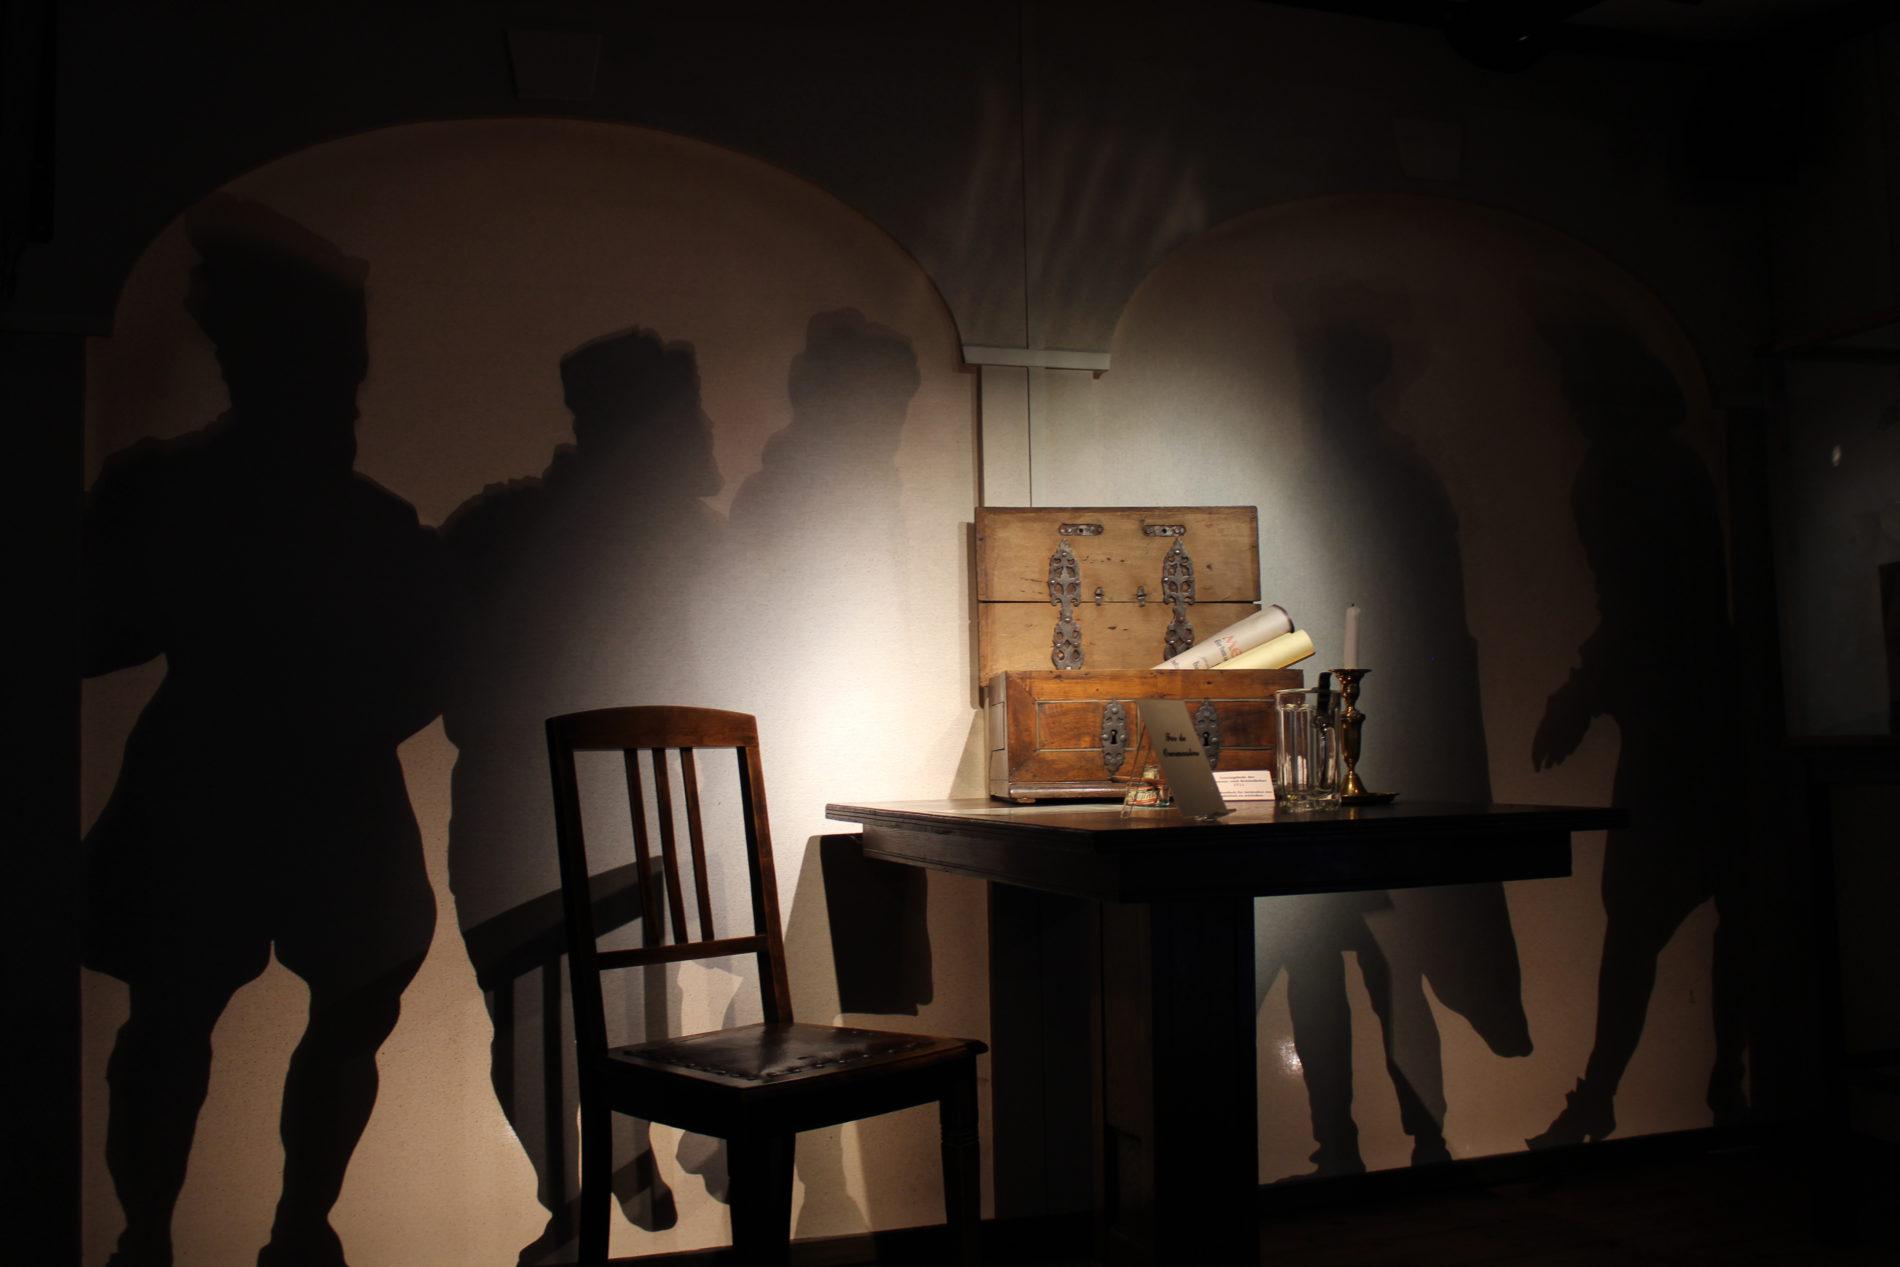 Zunftmuseum im OG des Domherrenhauses Verden